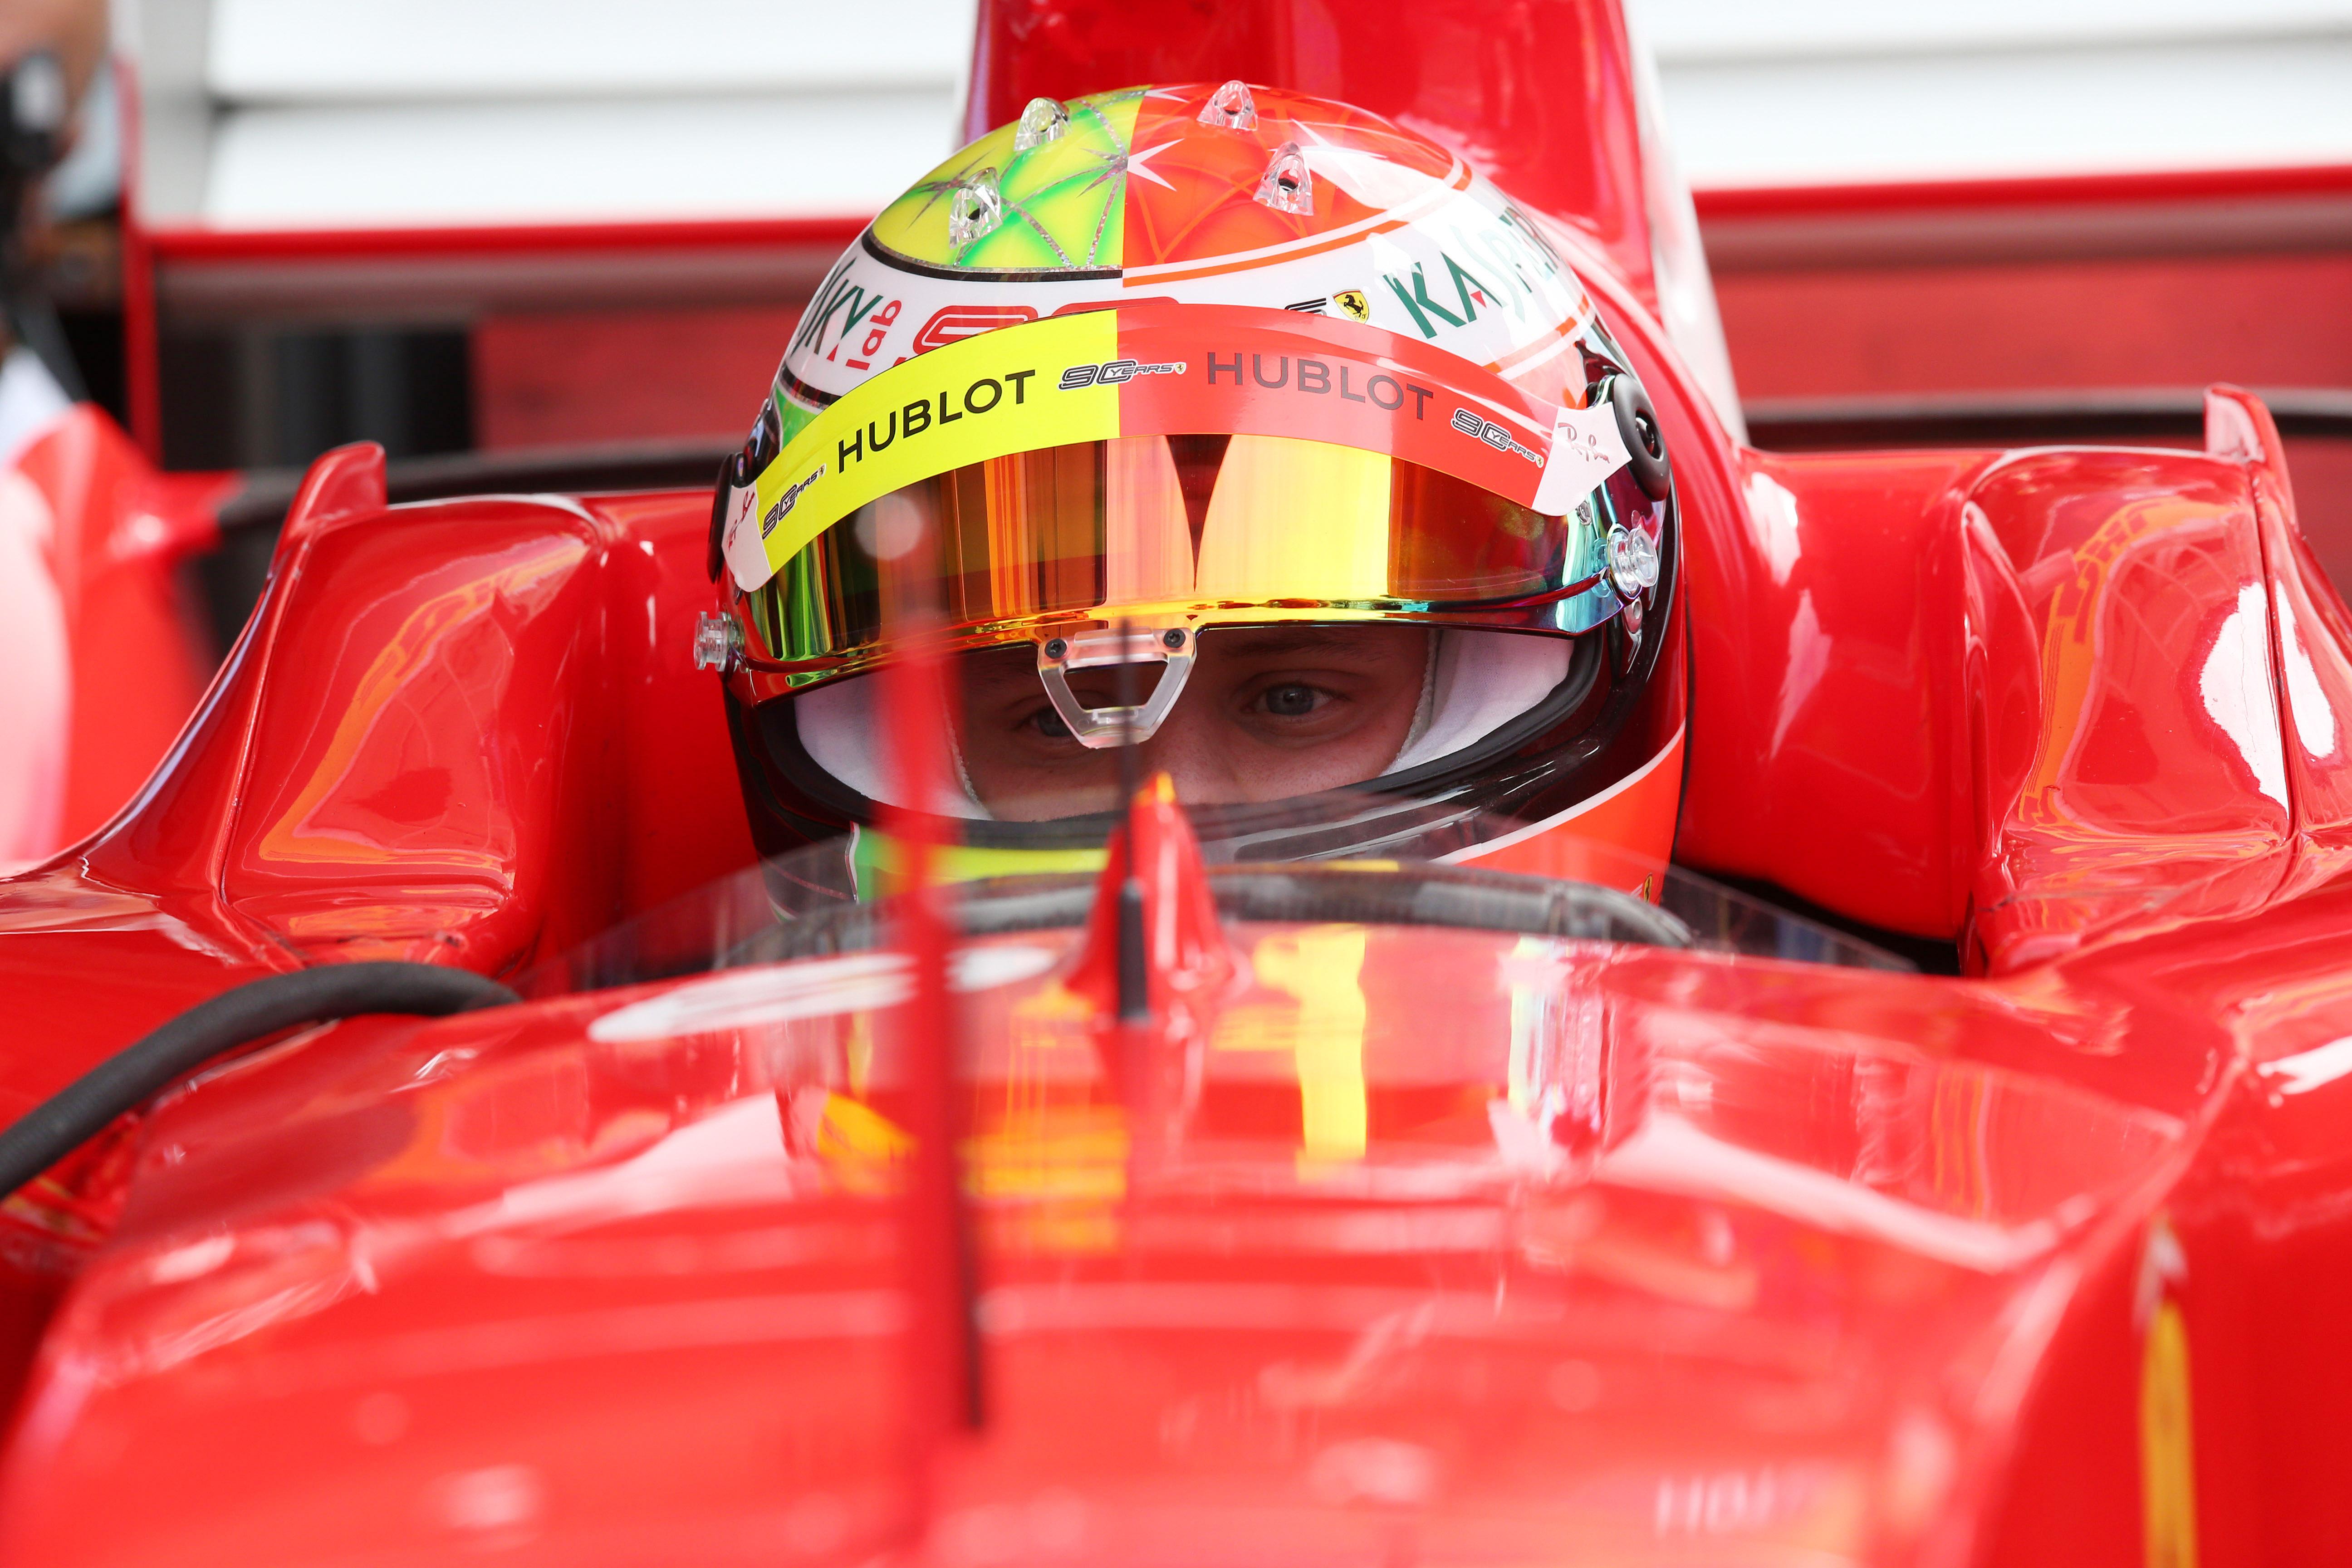 27.07.2019 - Mick Schumacher (GER) Ferrari Test Driver in the Ferrari F2003-GA driven by his father Michael Schumacher